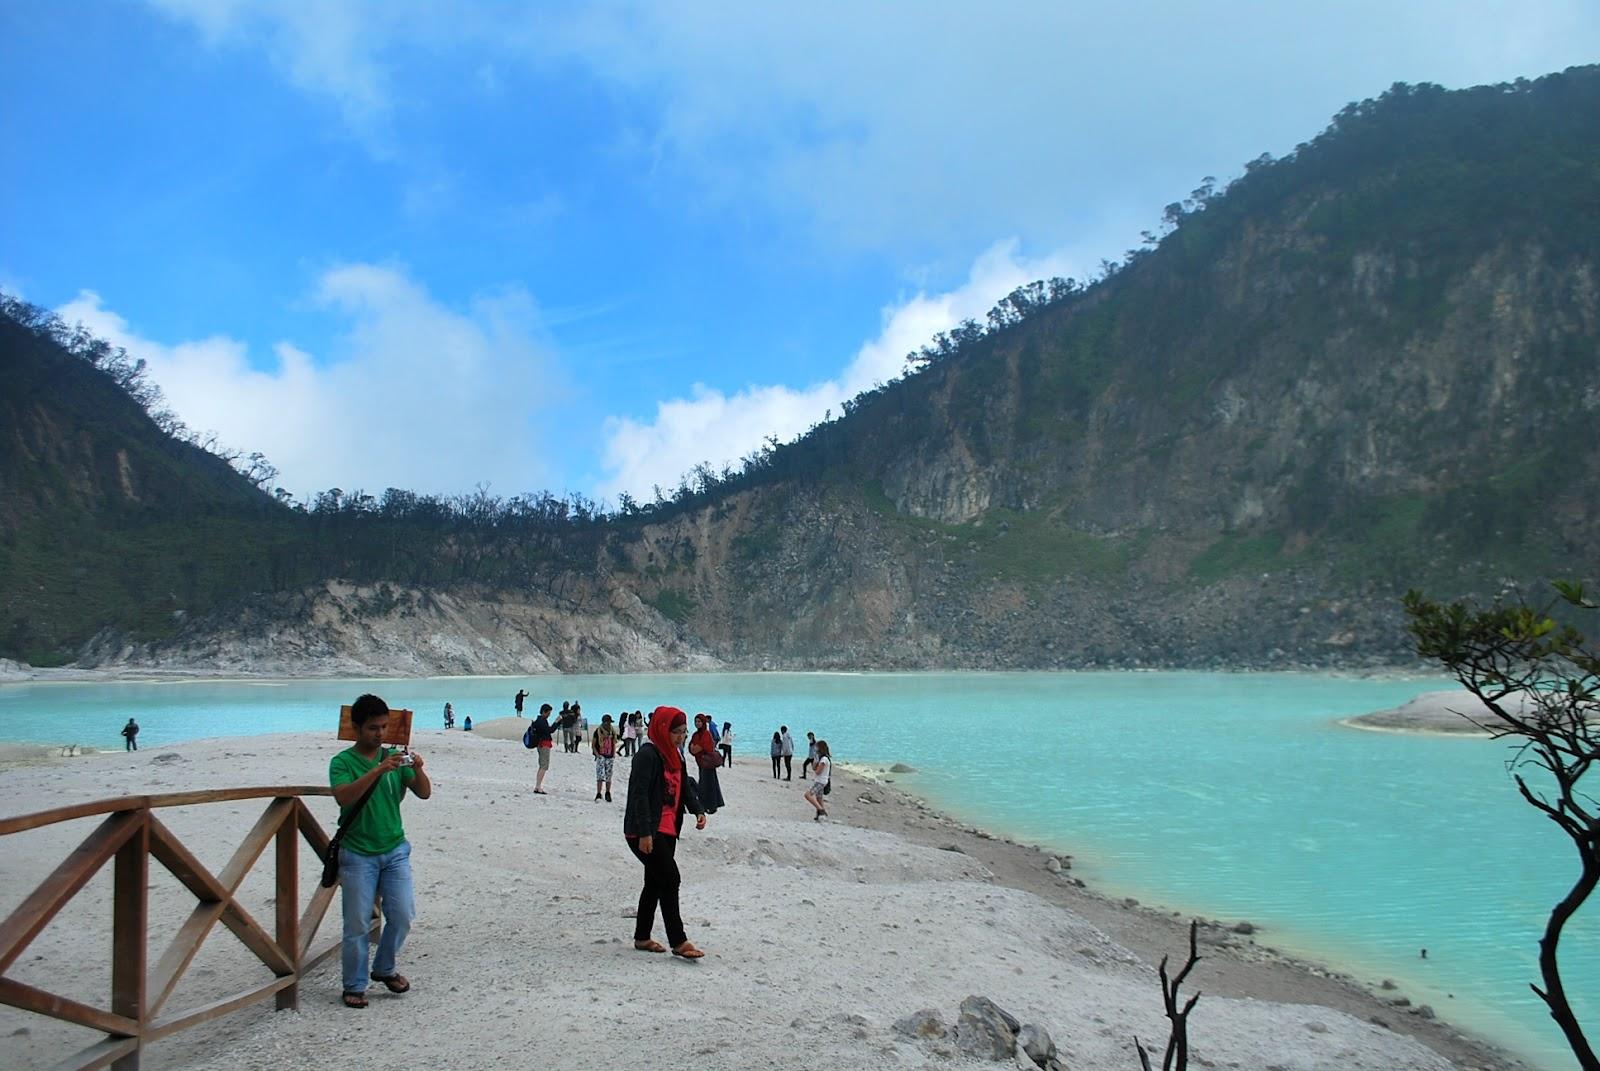 wisata Kawah Putih Ciwidey